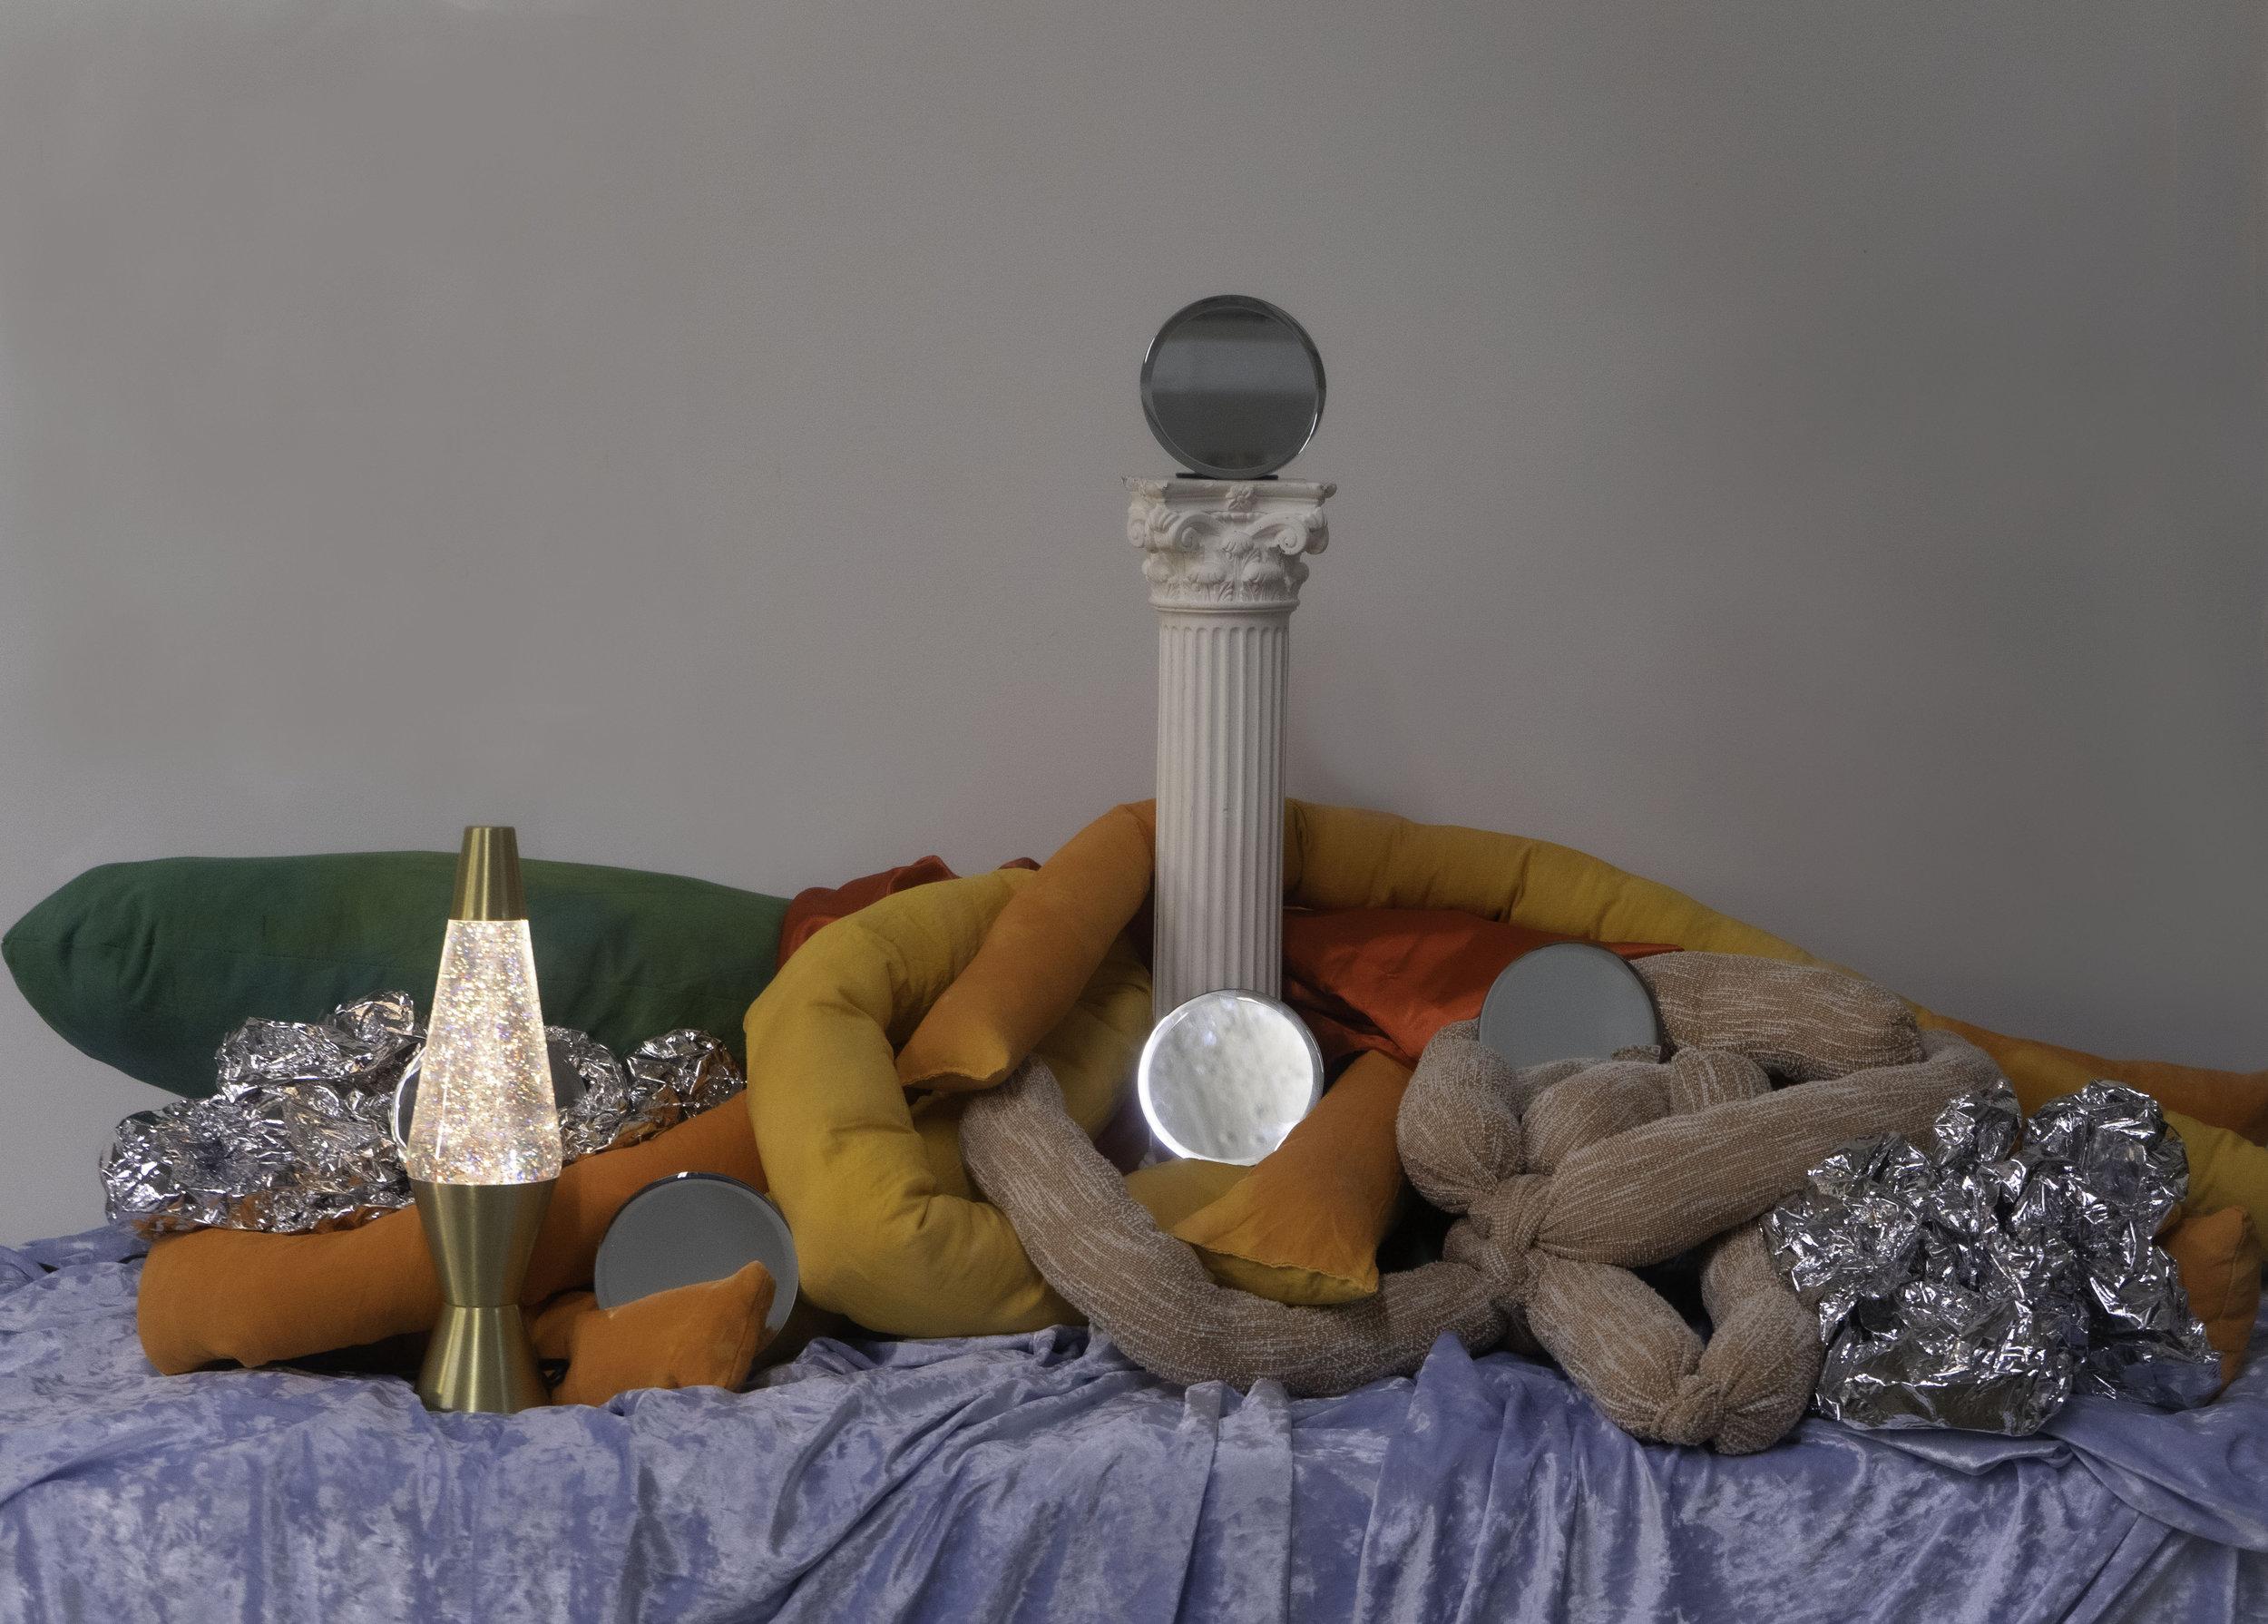 Art Direction & Photography:     Nereida Villareal      Soft Sculptures:    Tara LaPlante     Arts District, Los Angeles 2019